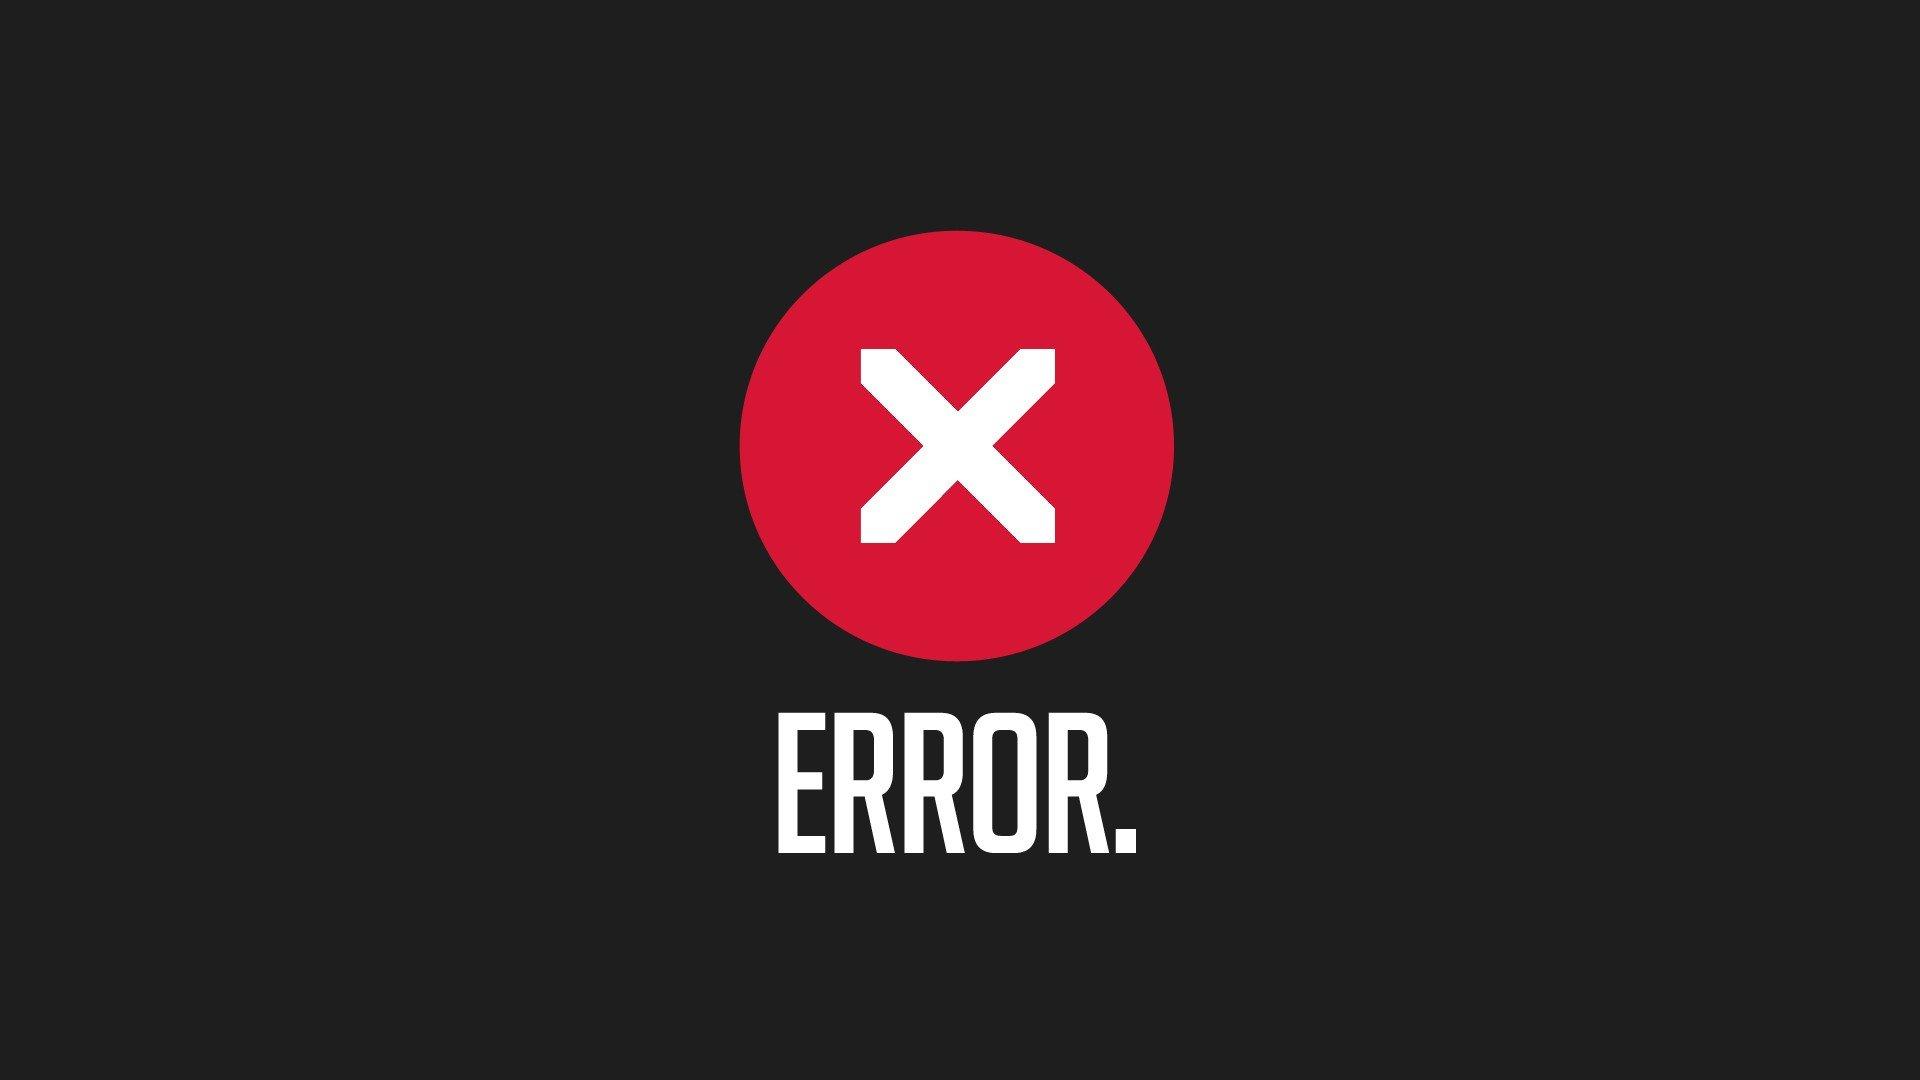 windows error wallpaper - photo #22